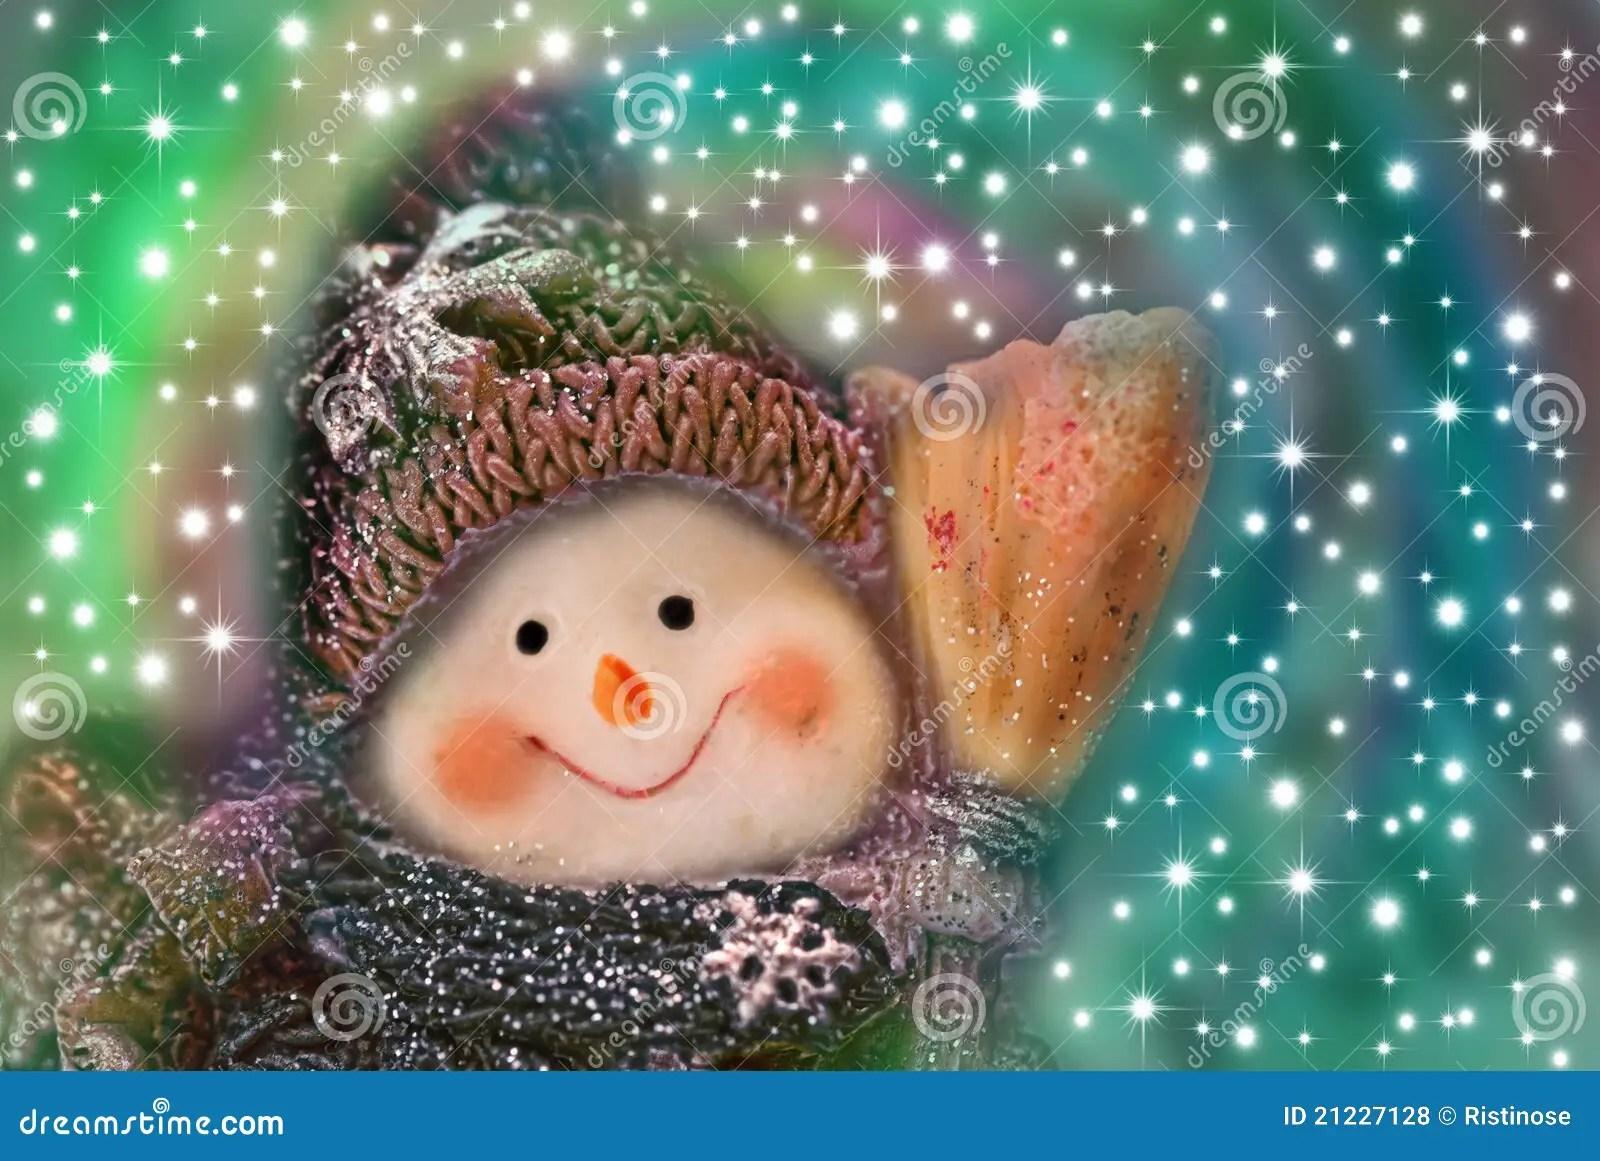 Christmas Card Funny Snowman Royalty Free Stock Photos